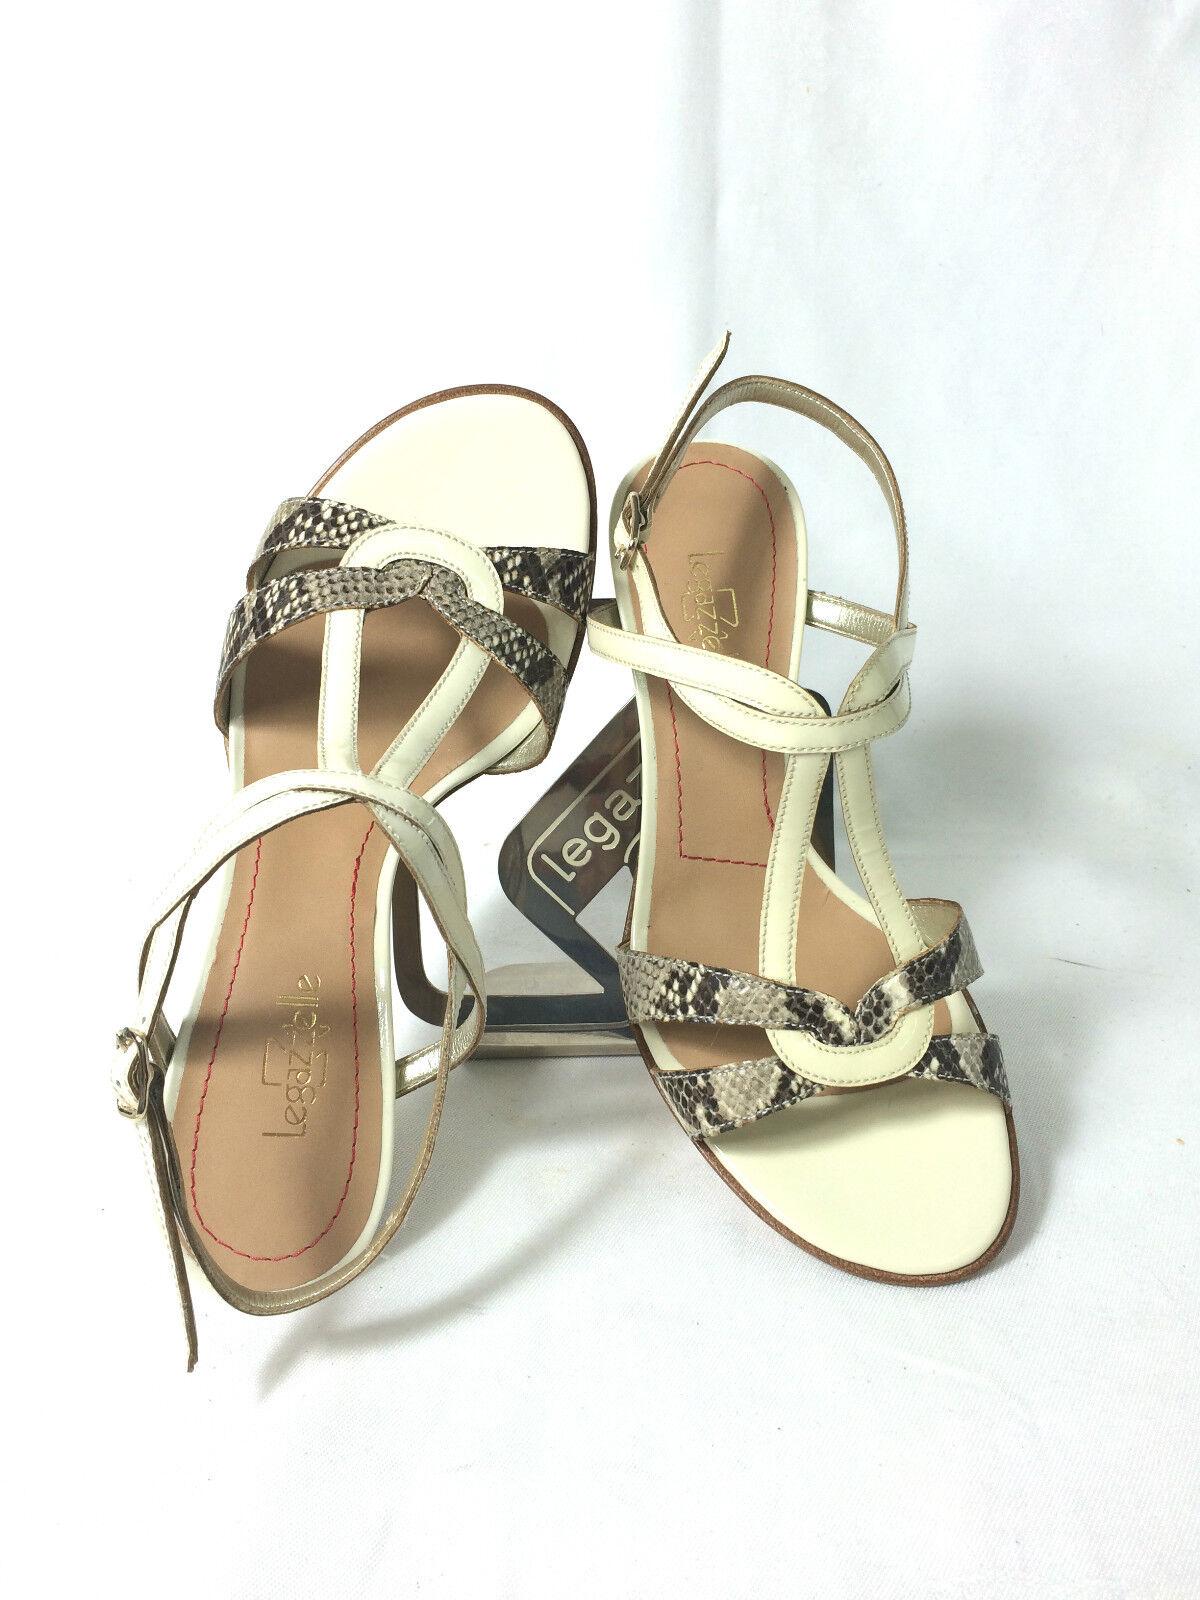 SANDALO SANDALO SANDALO MARCA LE GAZZELLE ColorE BEIGE PELLE VERNICE  H 7 ITALIAN zapatos  barato en línea